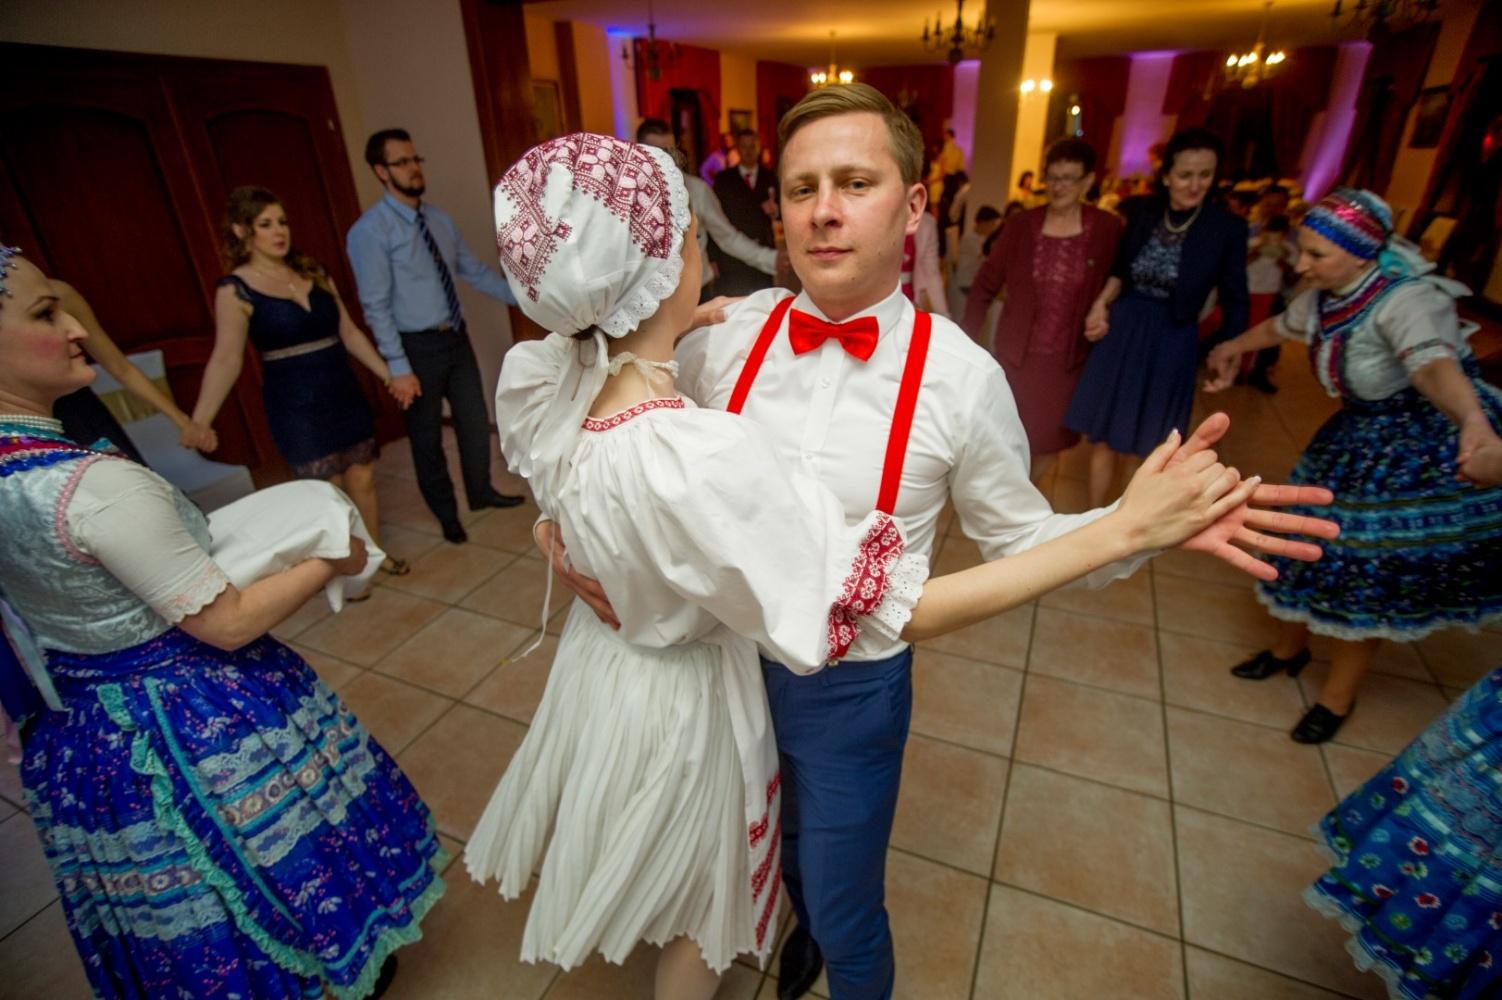 http://www.fotoz.sk/images/gallery-23/normal/svadba-_sv_petrus-vini_182.jpg